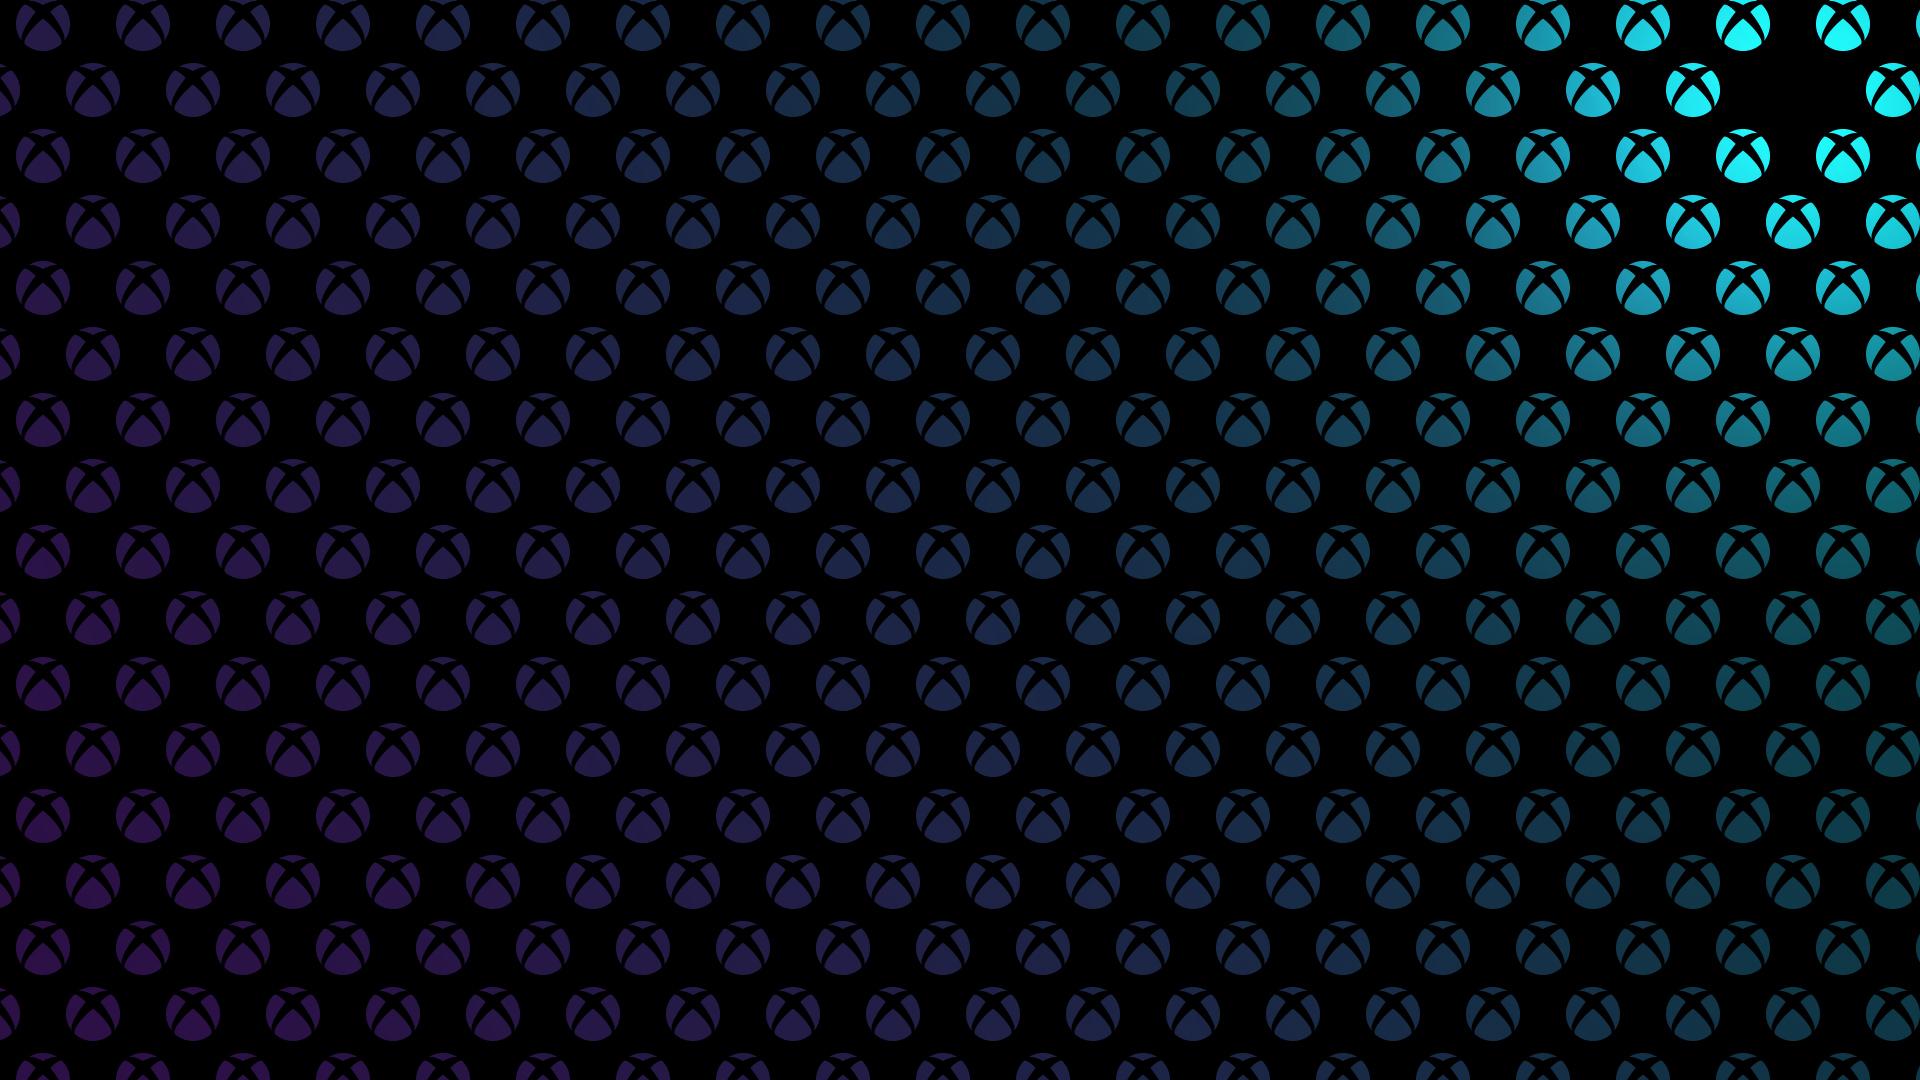 x1bg logo pattern teal purple martin crownover